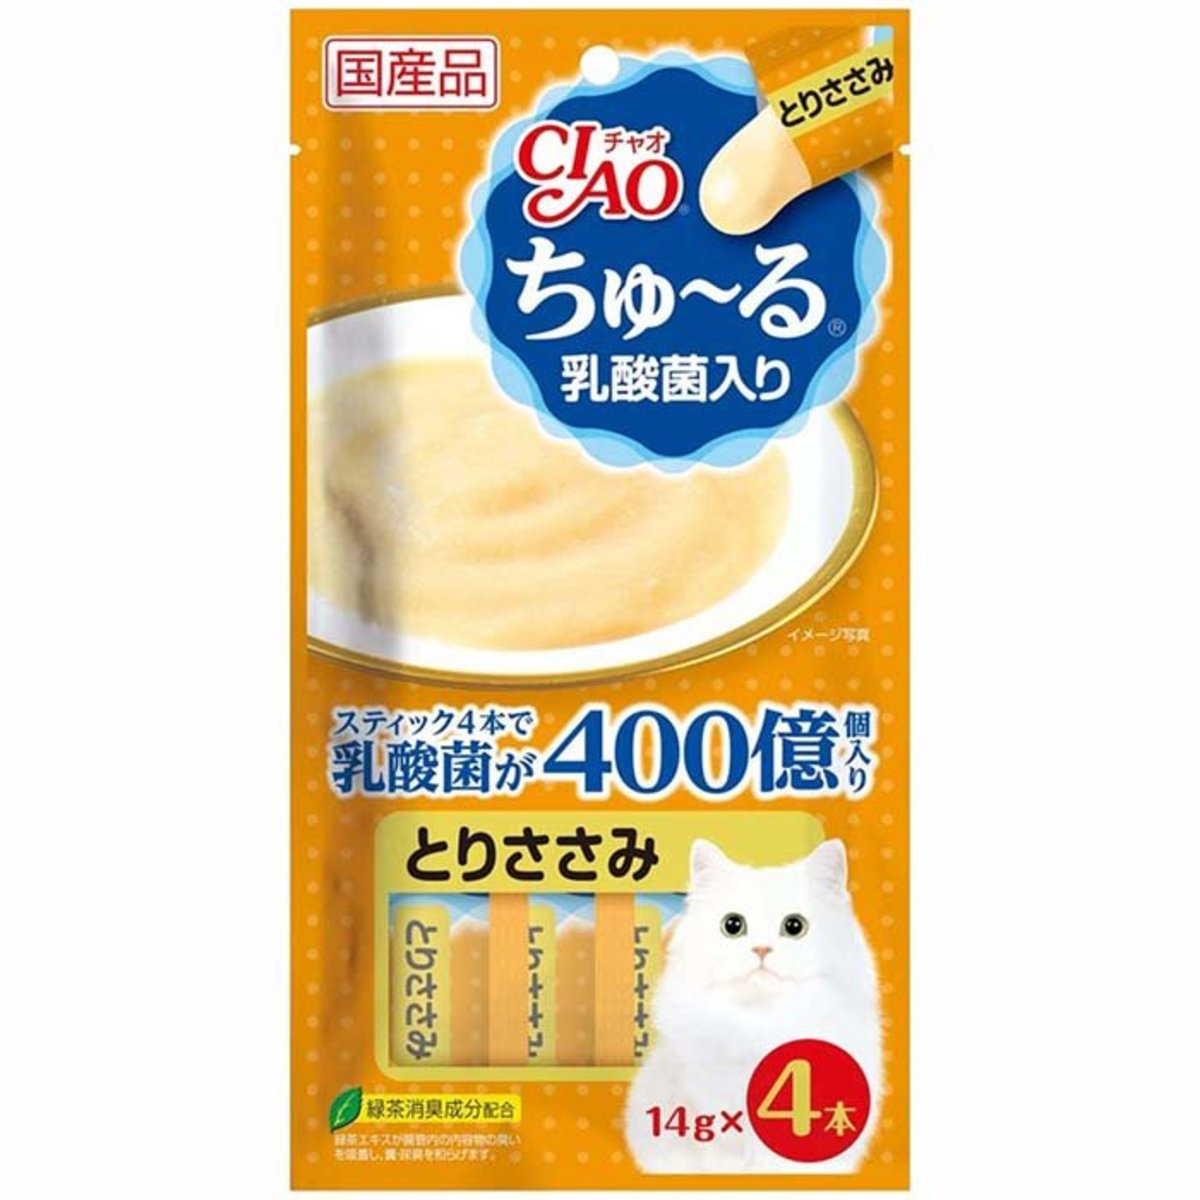 CIAO Sauce Pack-Lactic Acid Bacteria x Chicken Sauce 14g x 4pcs